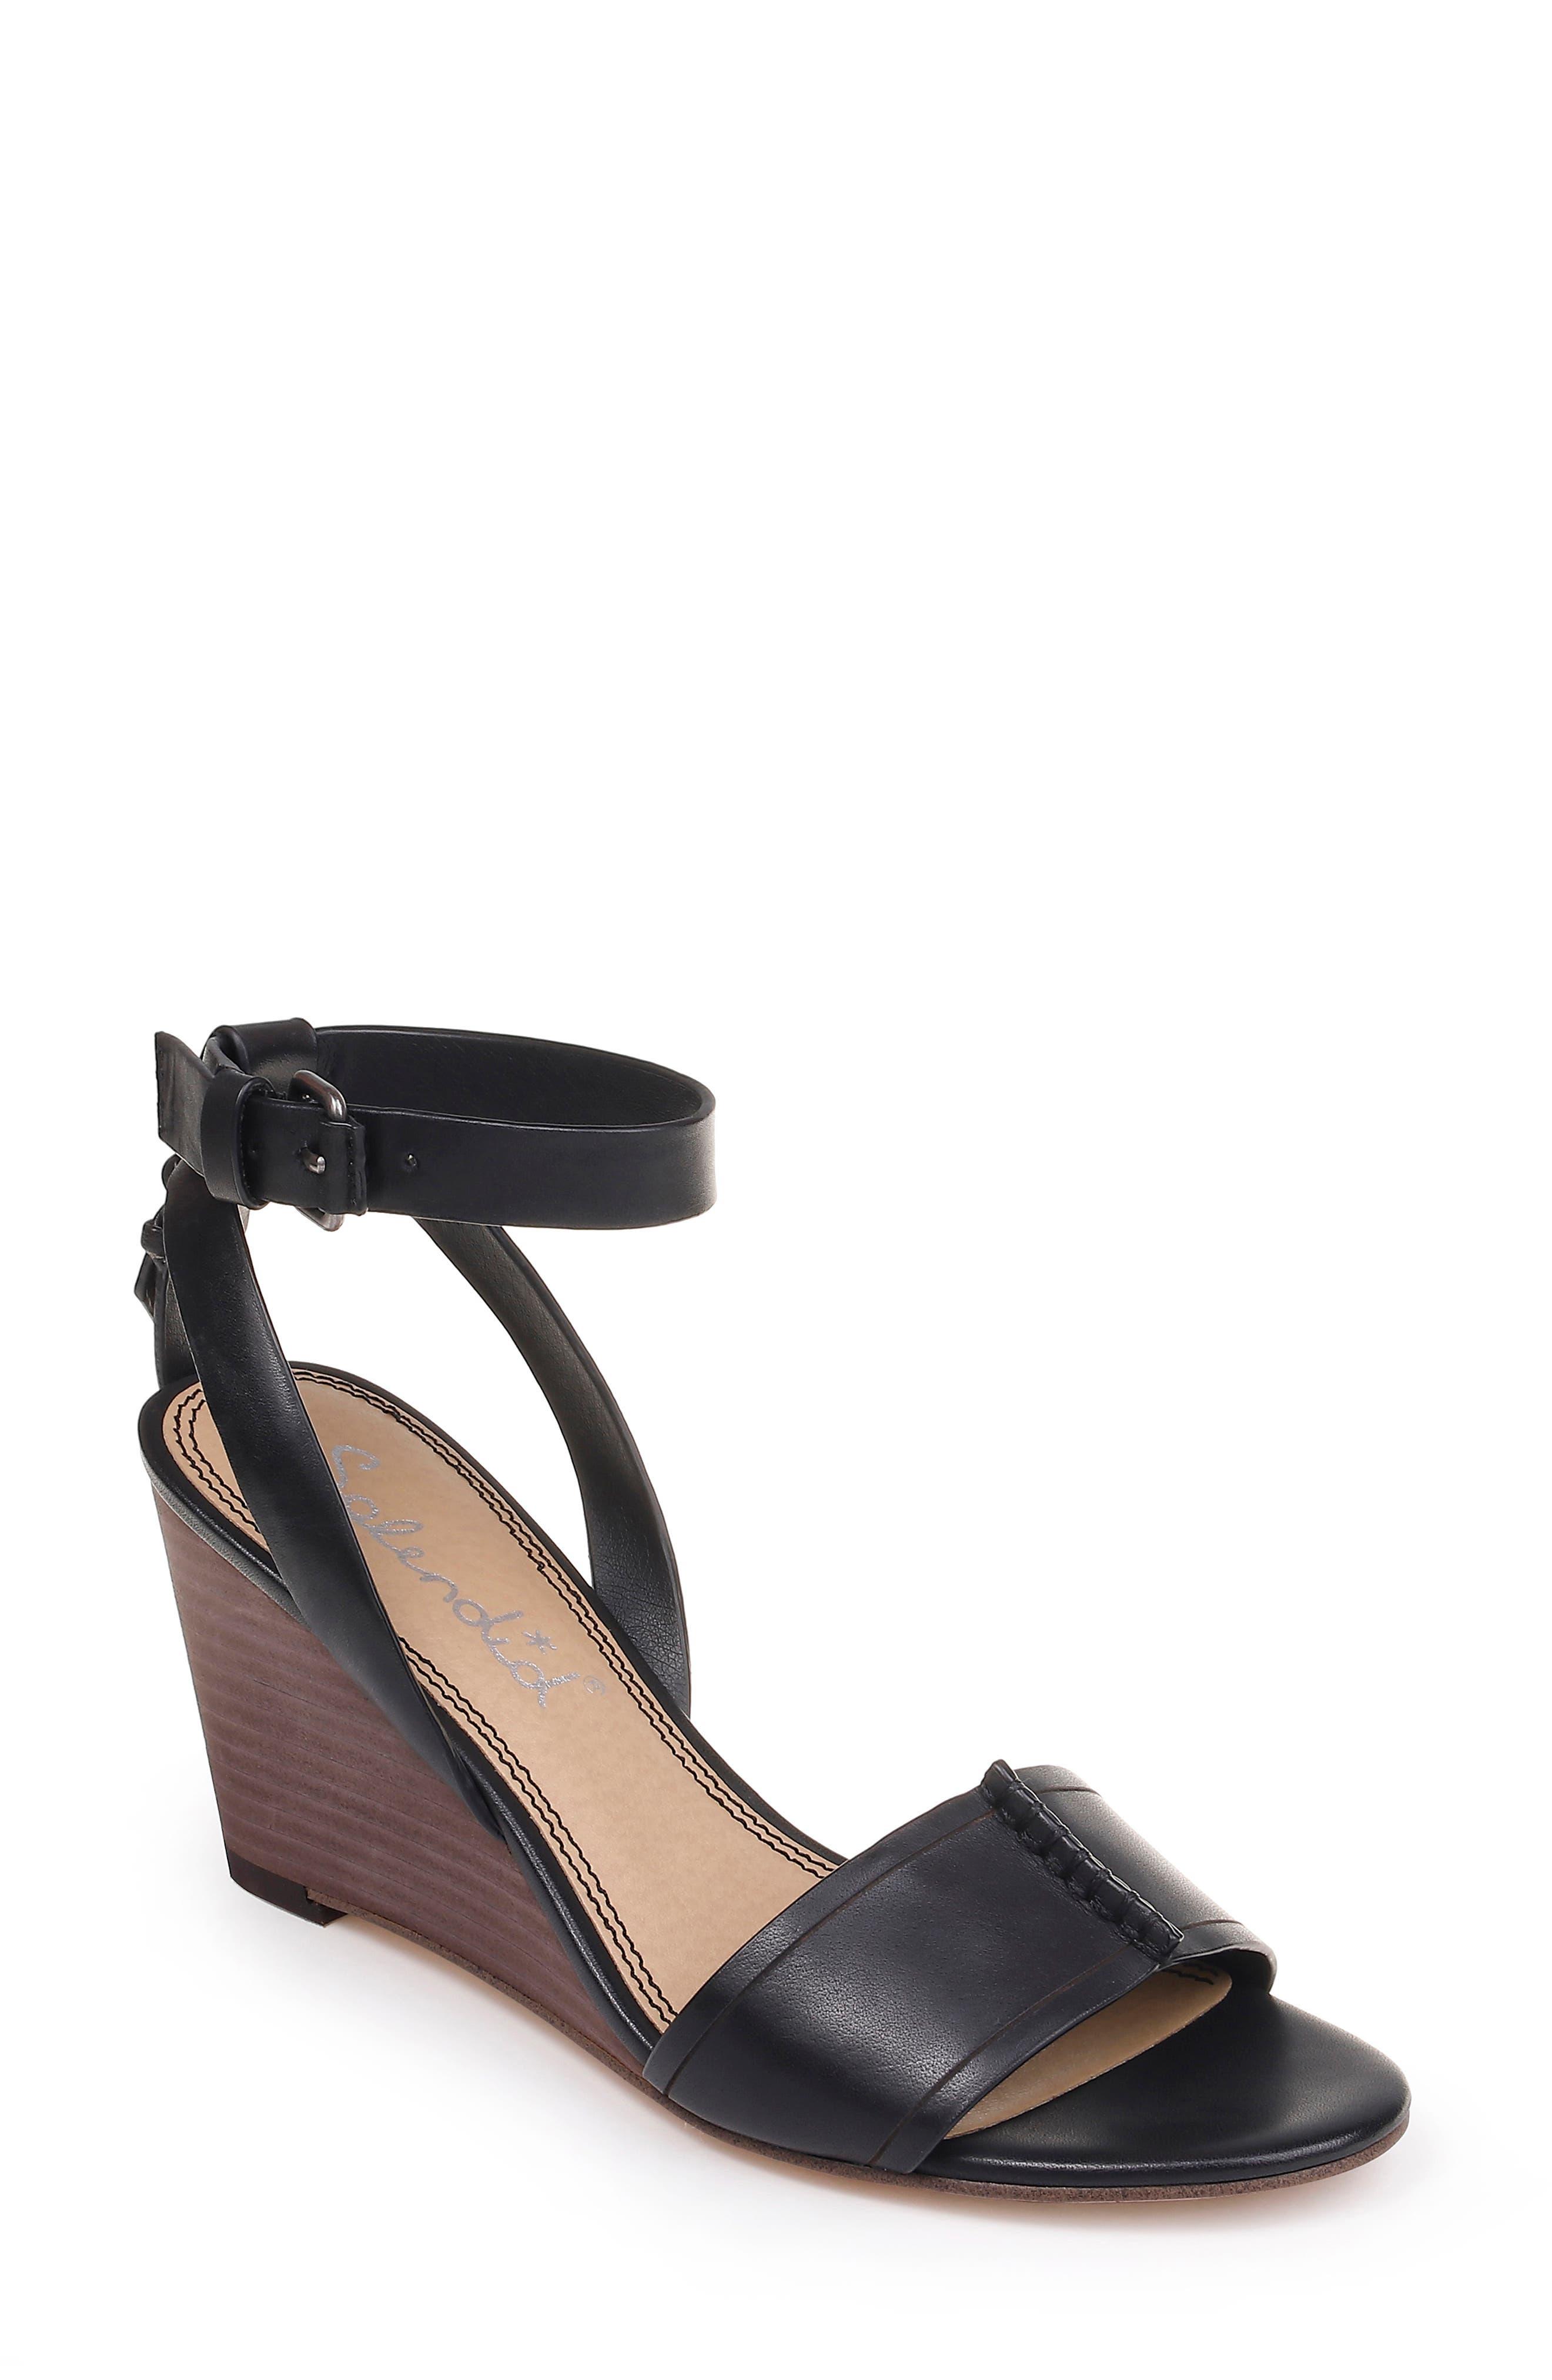 SPLENDID Tadeo Wedge Ankle Strap Sandal, Main, color, BLACK LEATHER